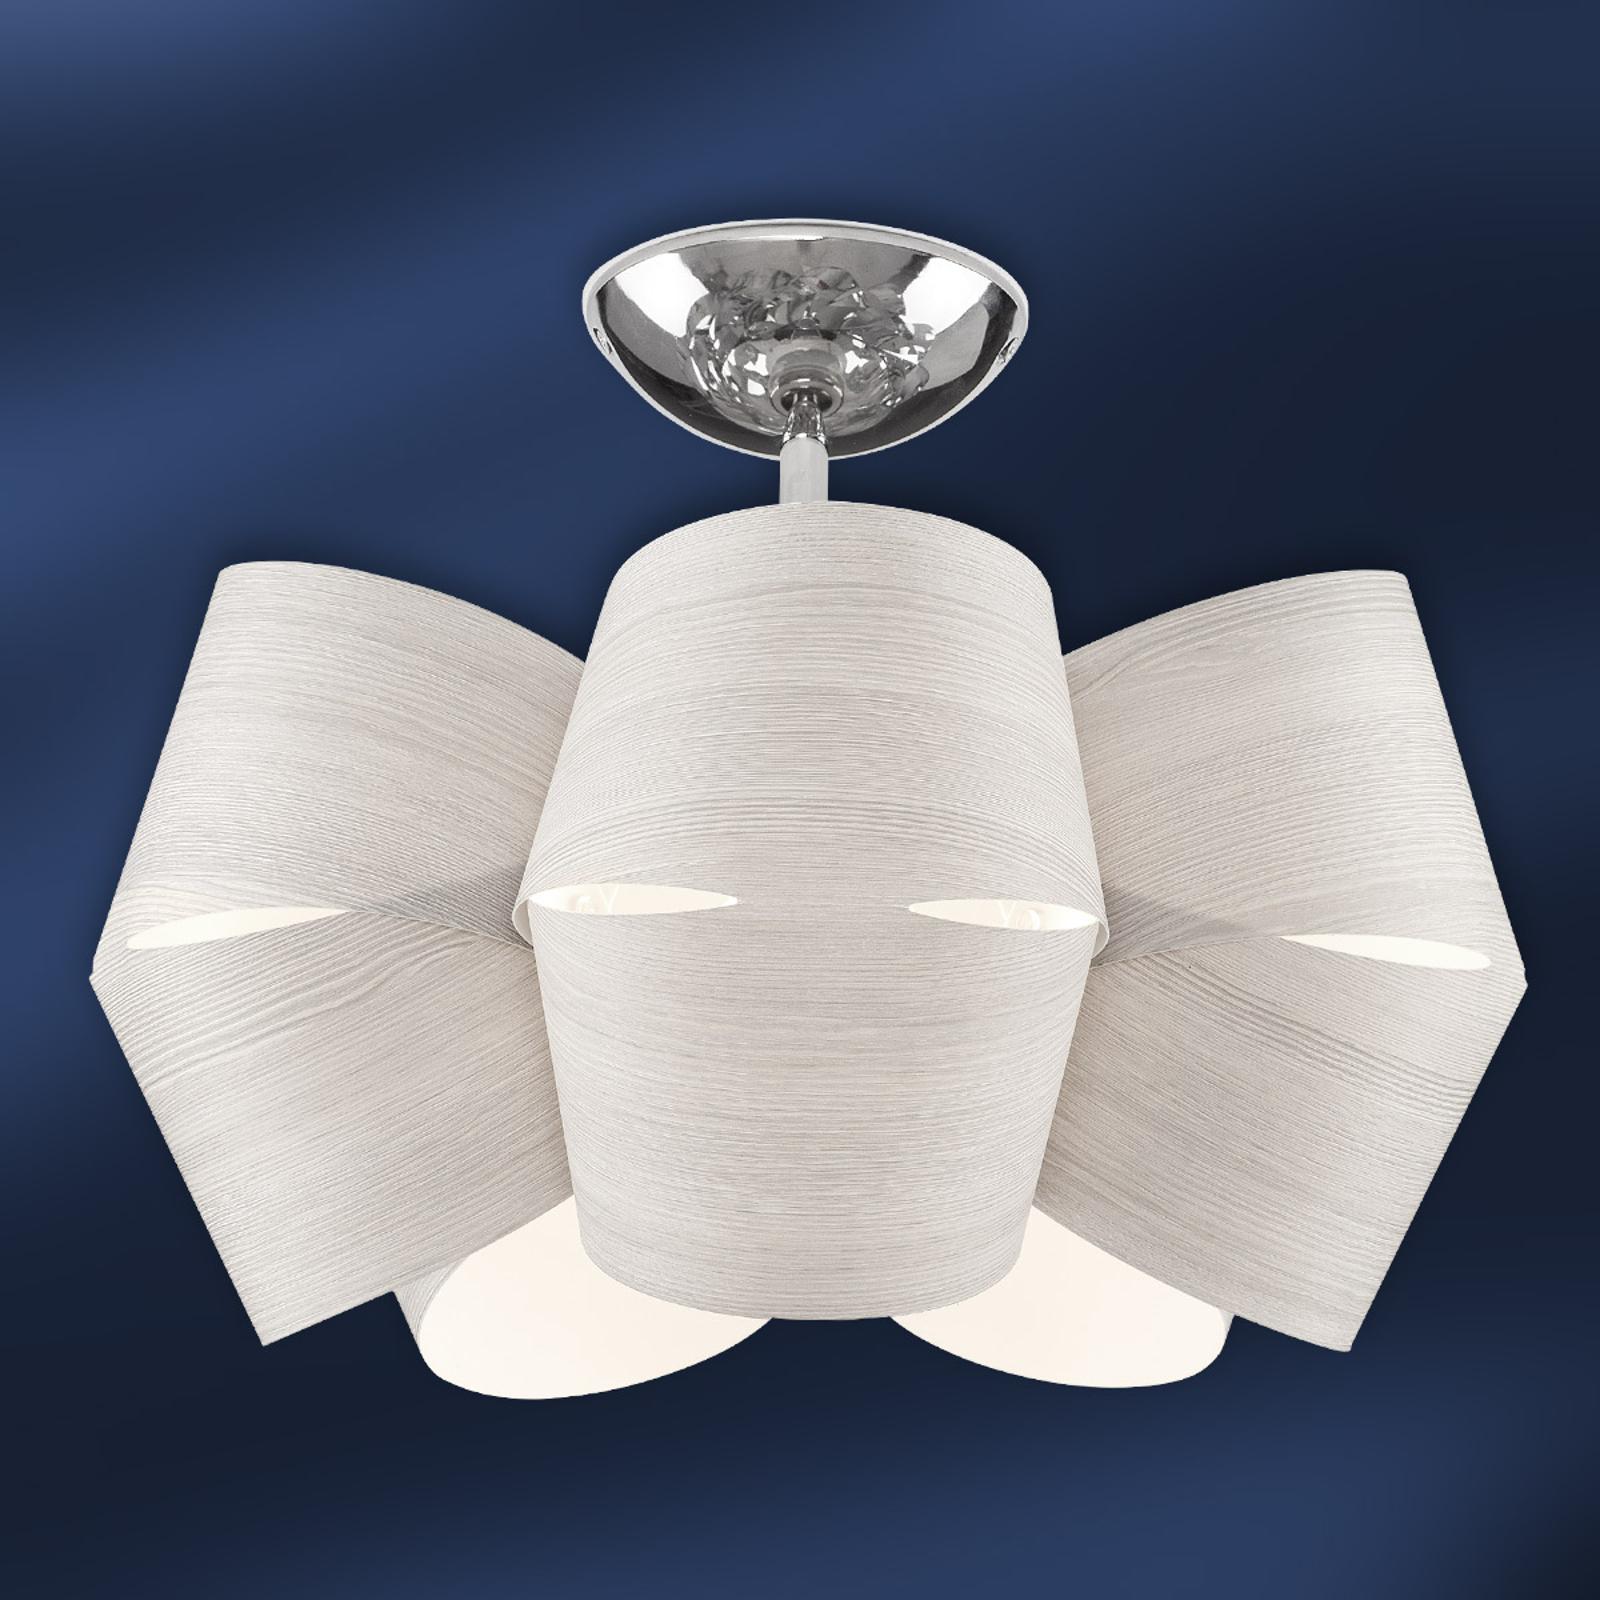 Larch wood ceiling light Sky Mini Alien ice grey_1056074_1